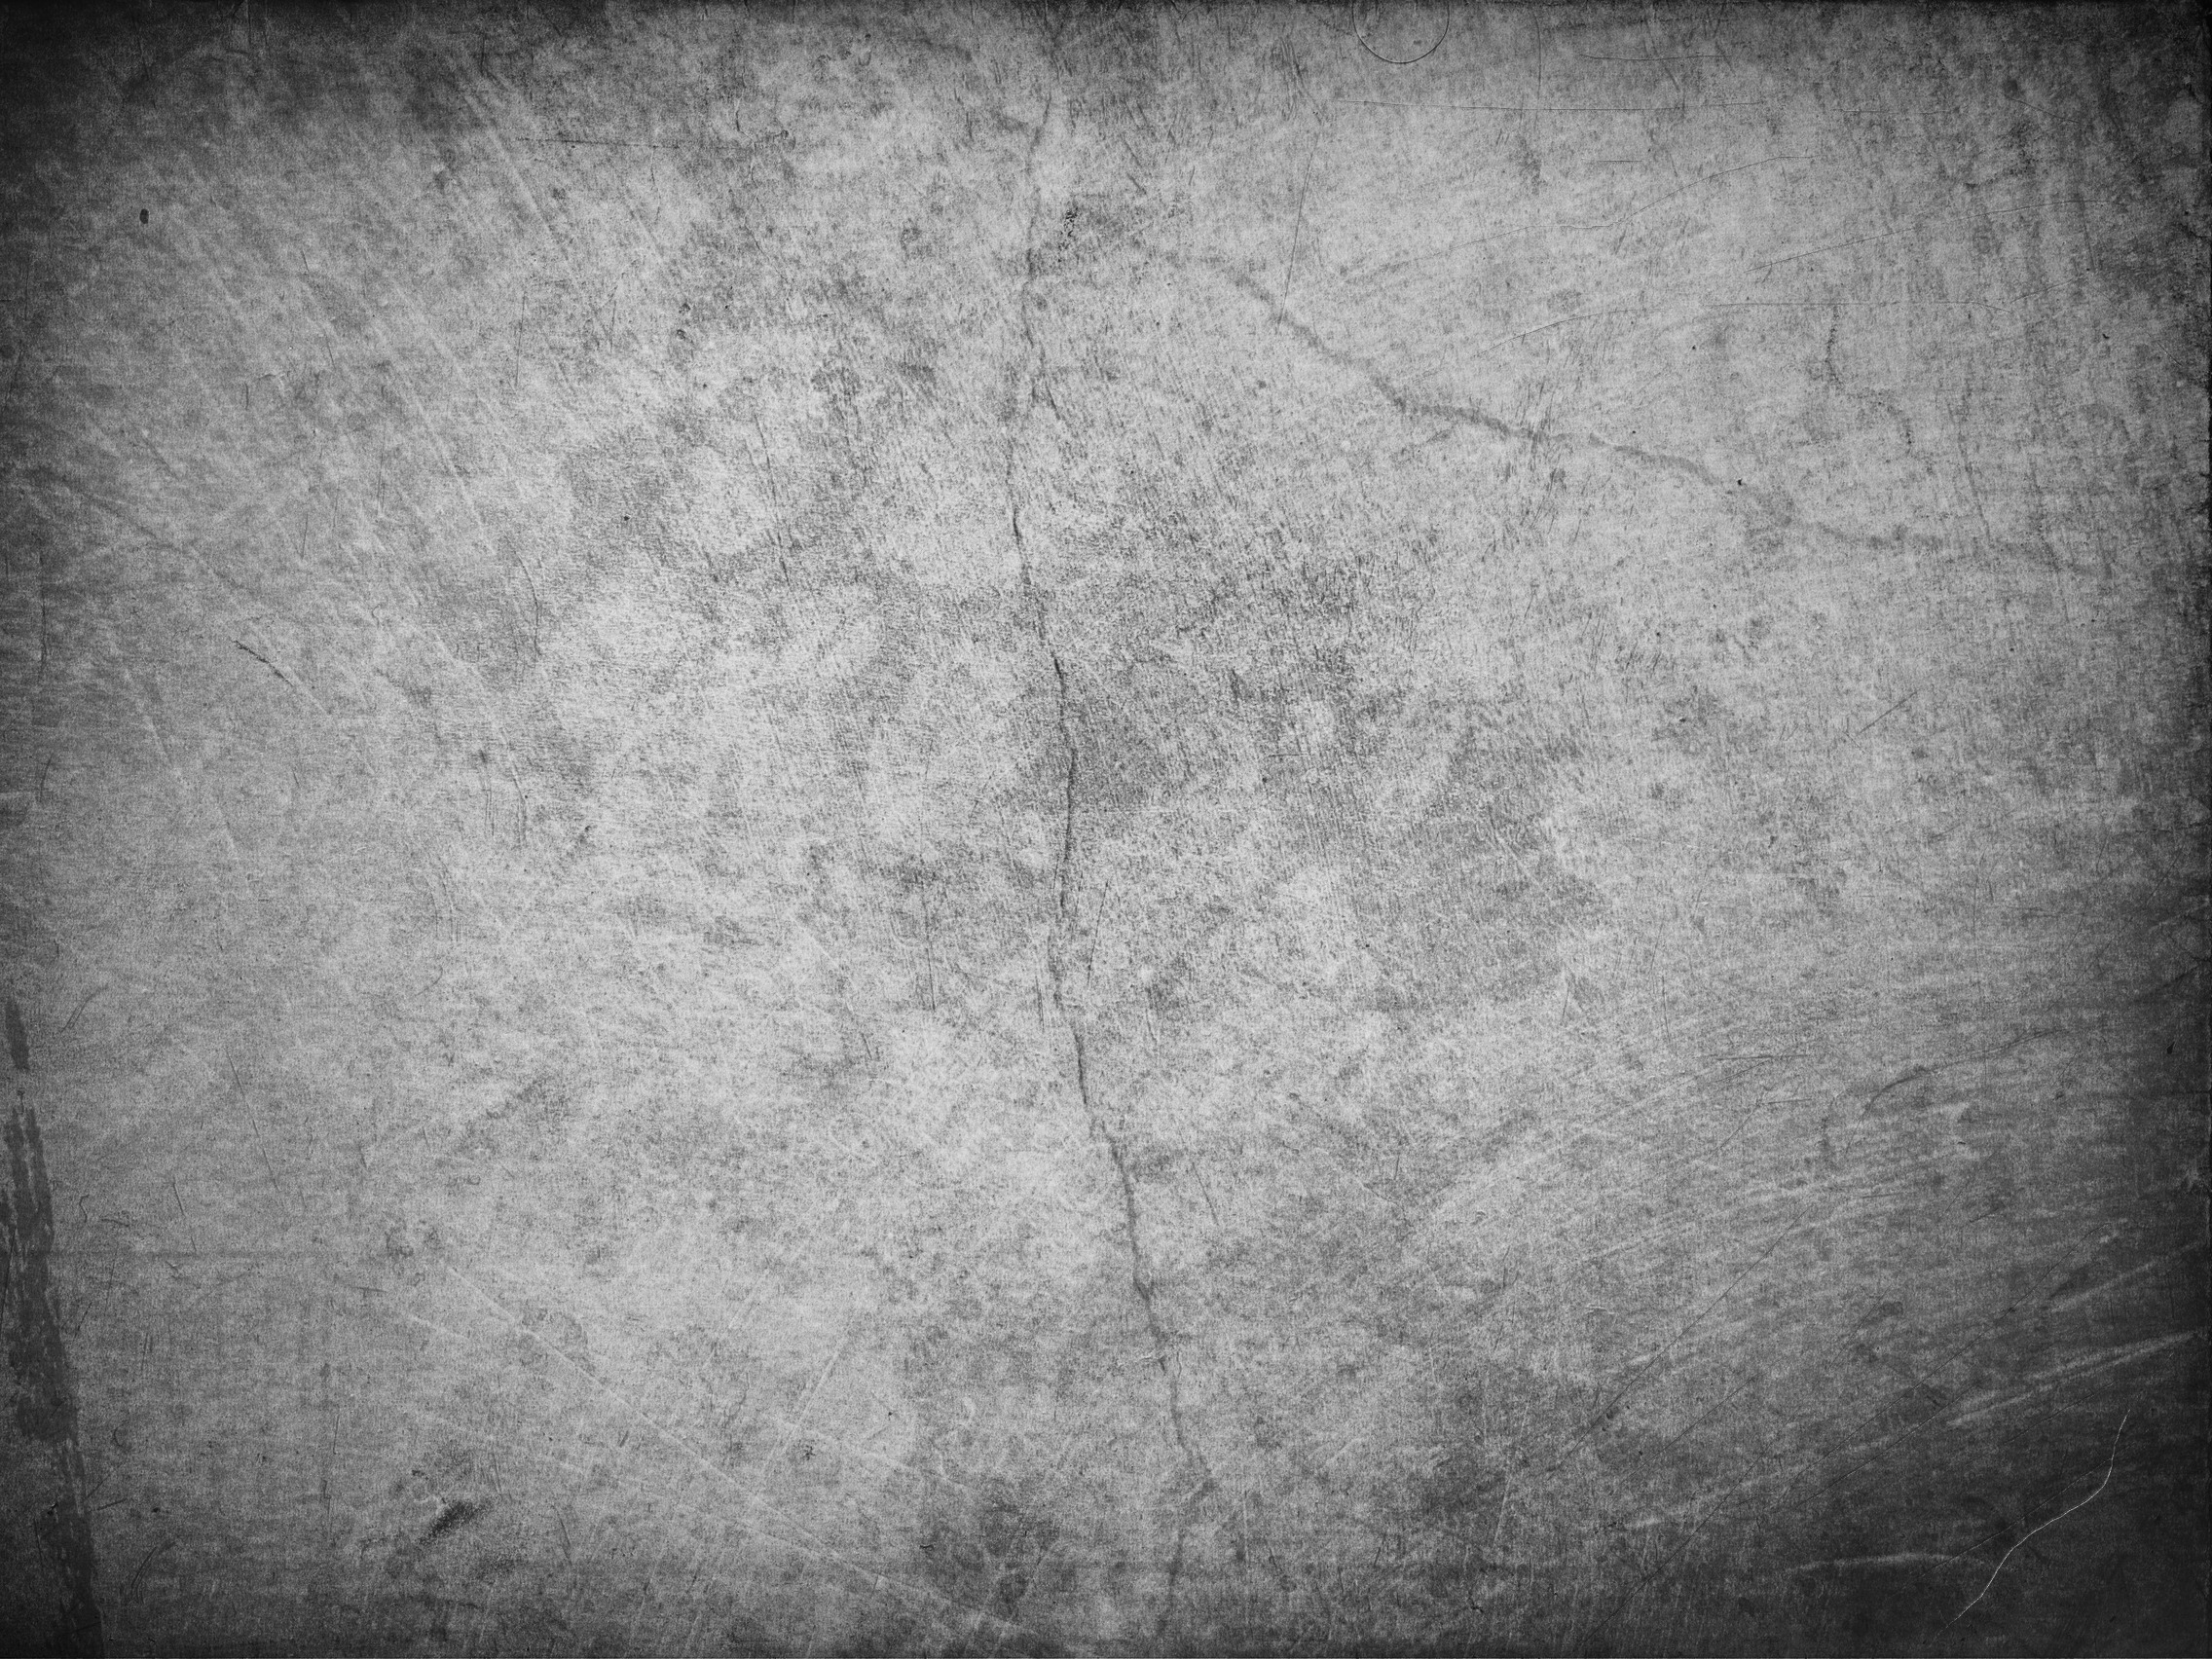 Download Grunge Texture Iii Wallpaper 2272x1704 Full HD Wallpapers 2272x1704